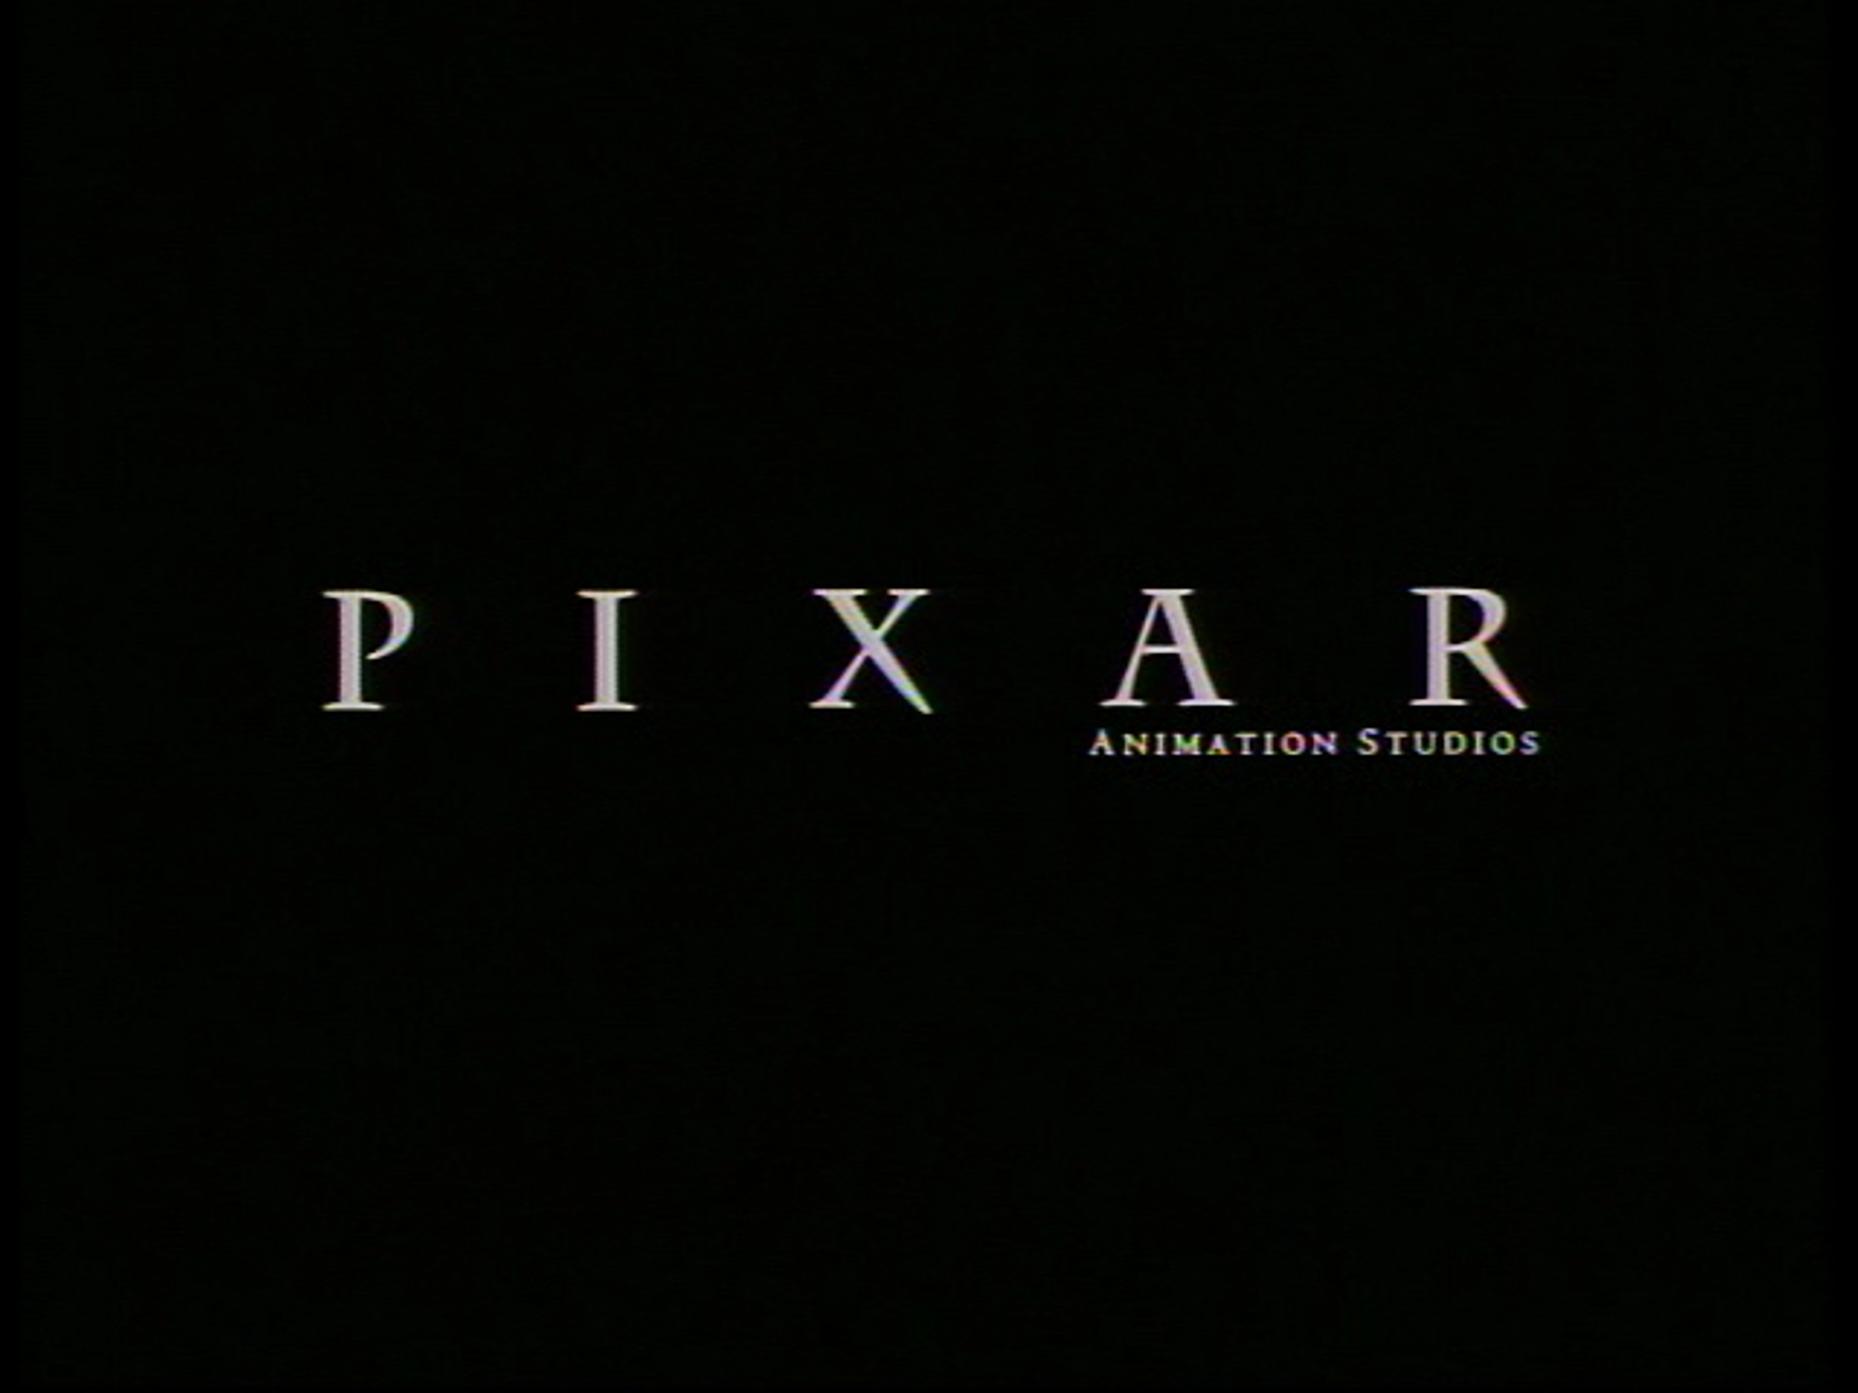 image pixar logo toy story trailer variantpng